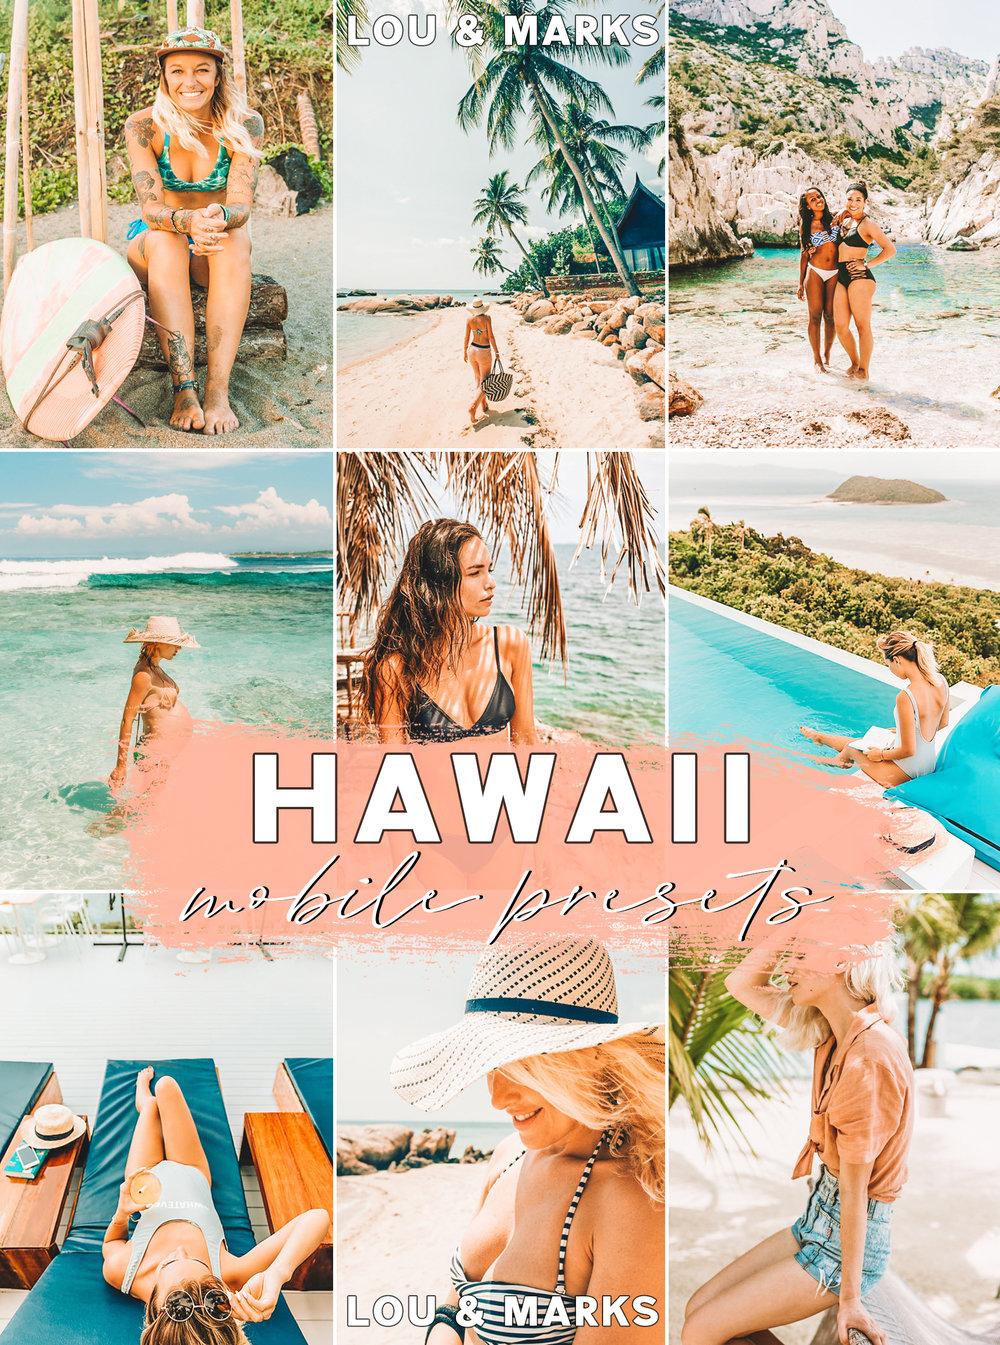 HAWAII-NEW-LOU-MOBILES-COVERS.jpg